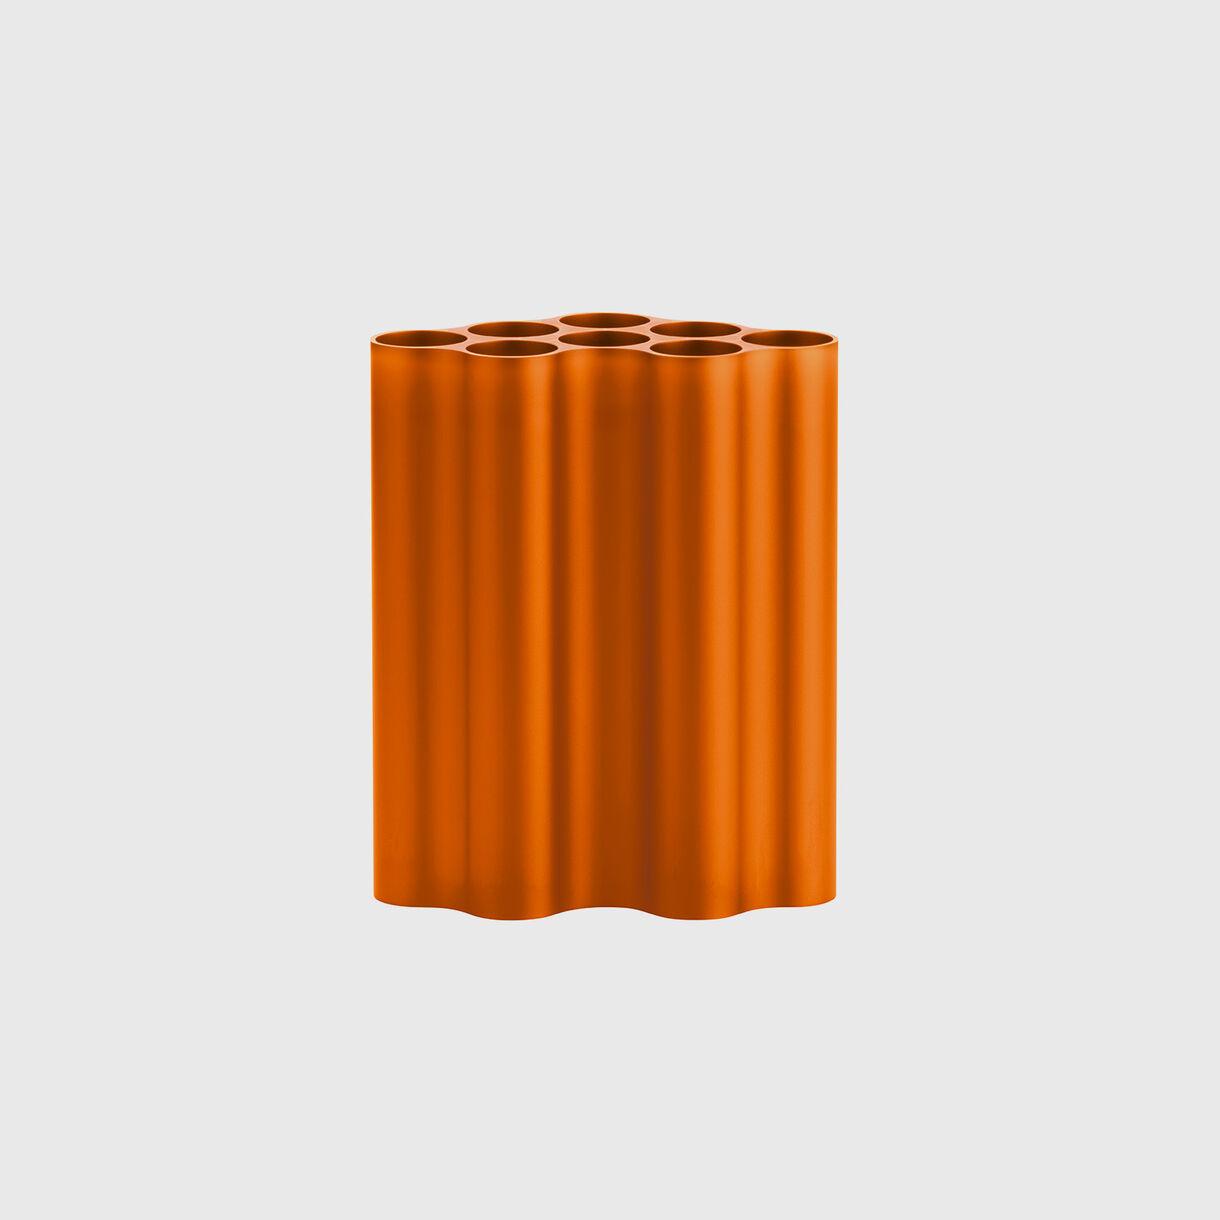 Nuage Vase, Burnt Orange, Medium